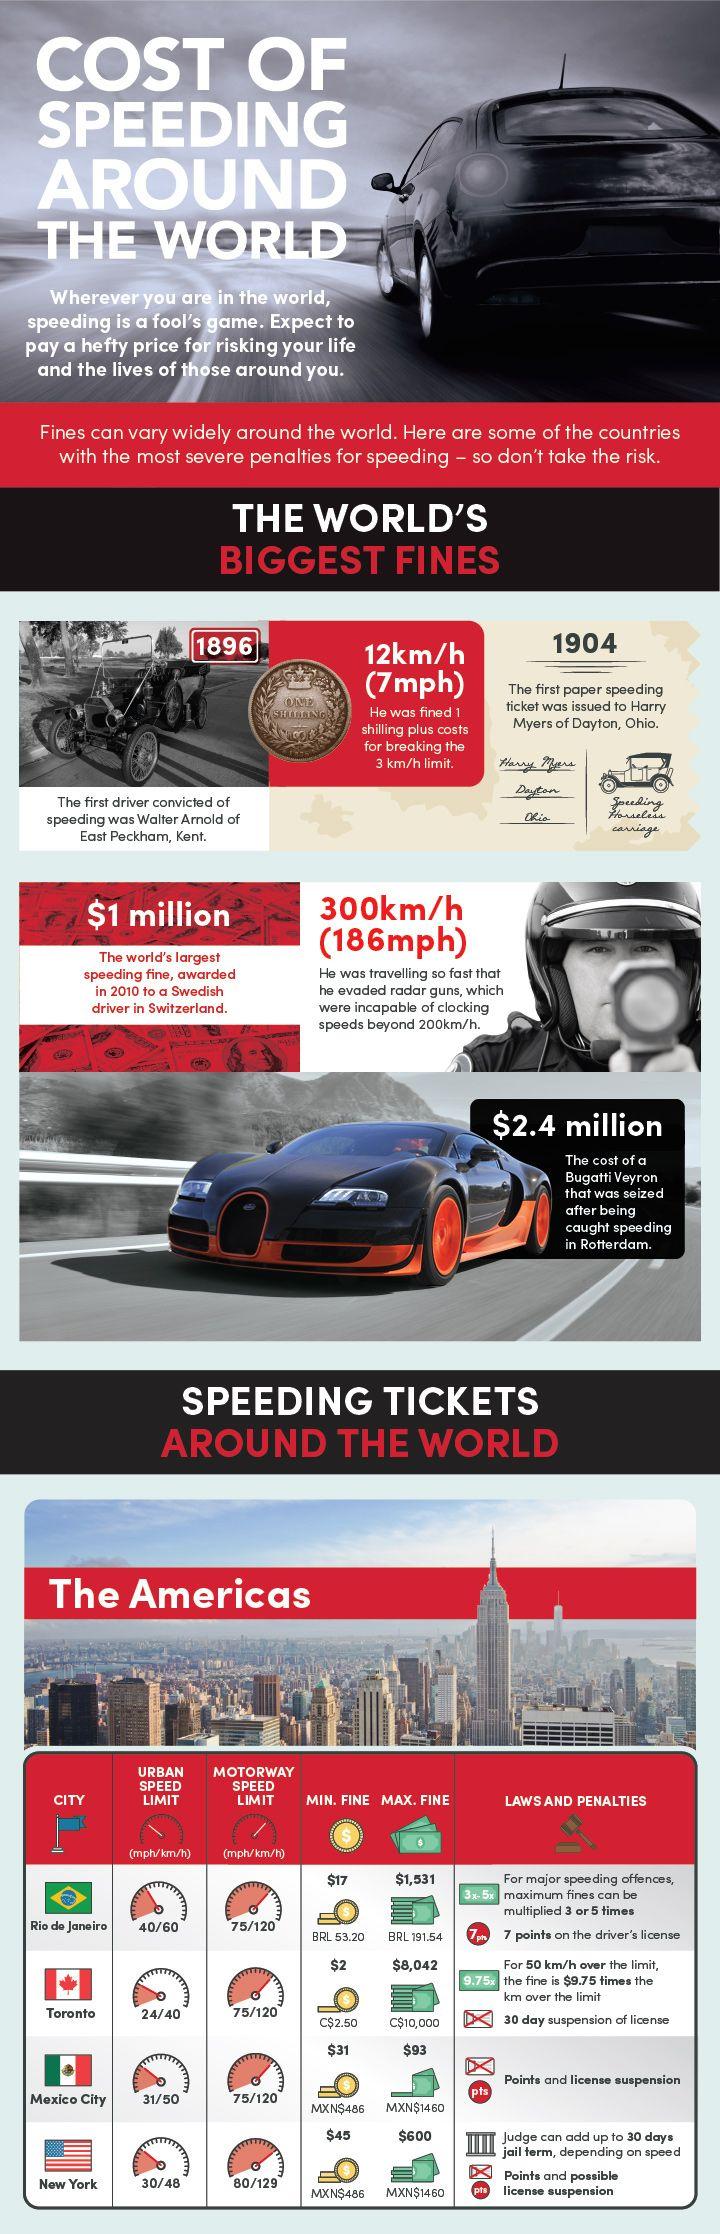 The cost of speeding around the world 1